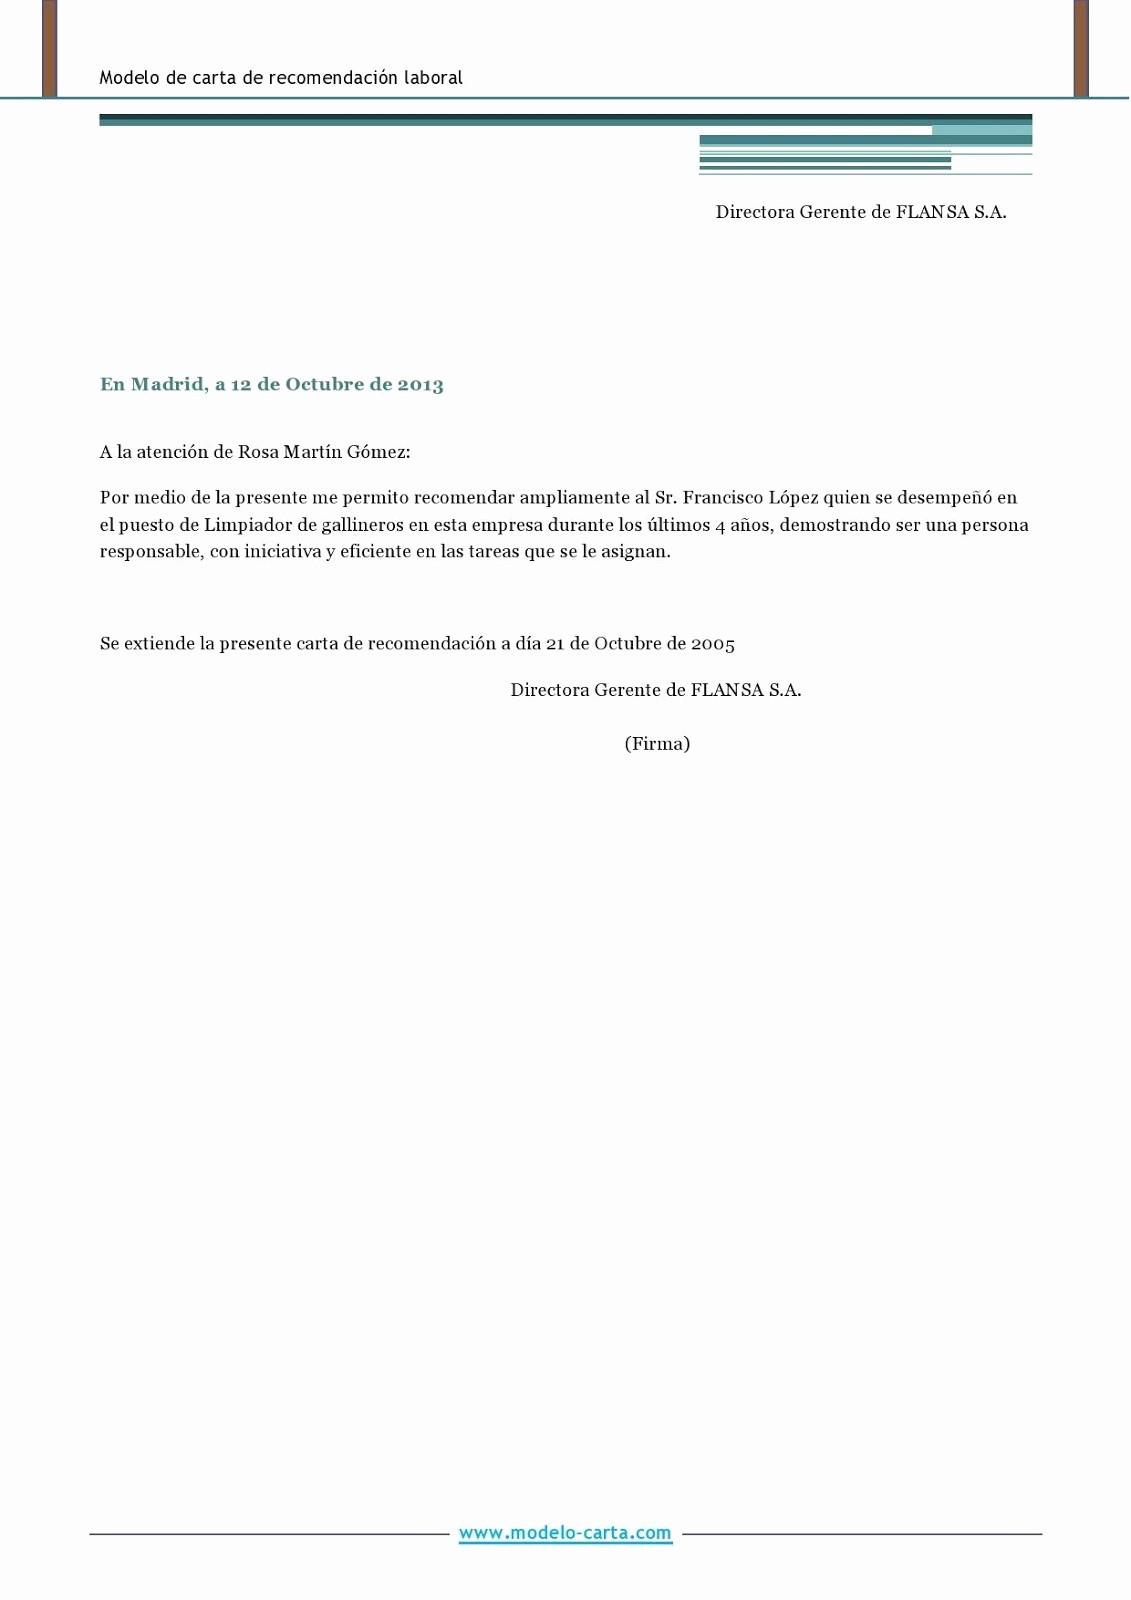 Formato De Carta Recomendacion Laboral Inspirational Carta De Re Endacion Personal Word Wood Scribd Mexico